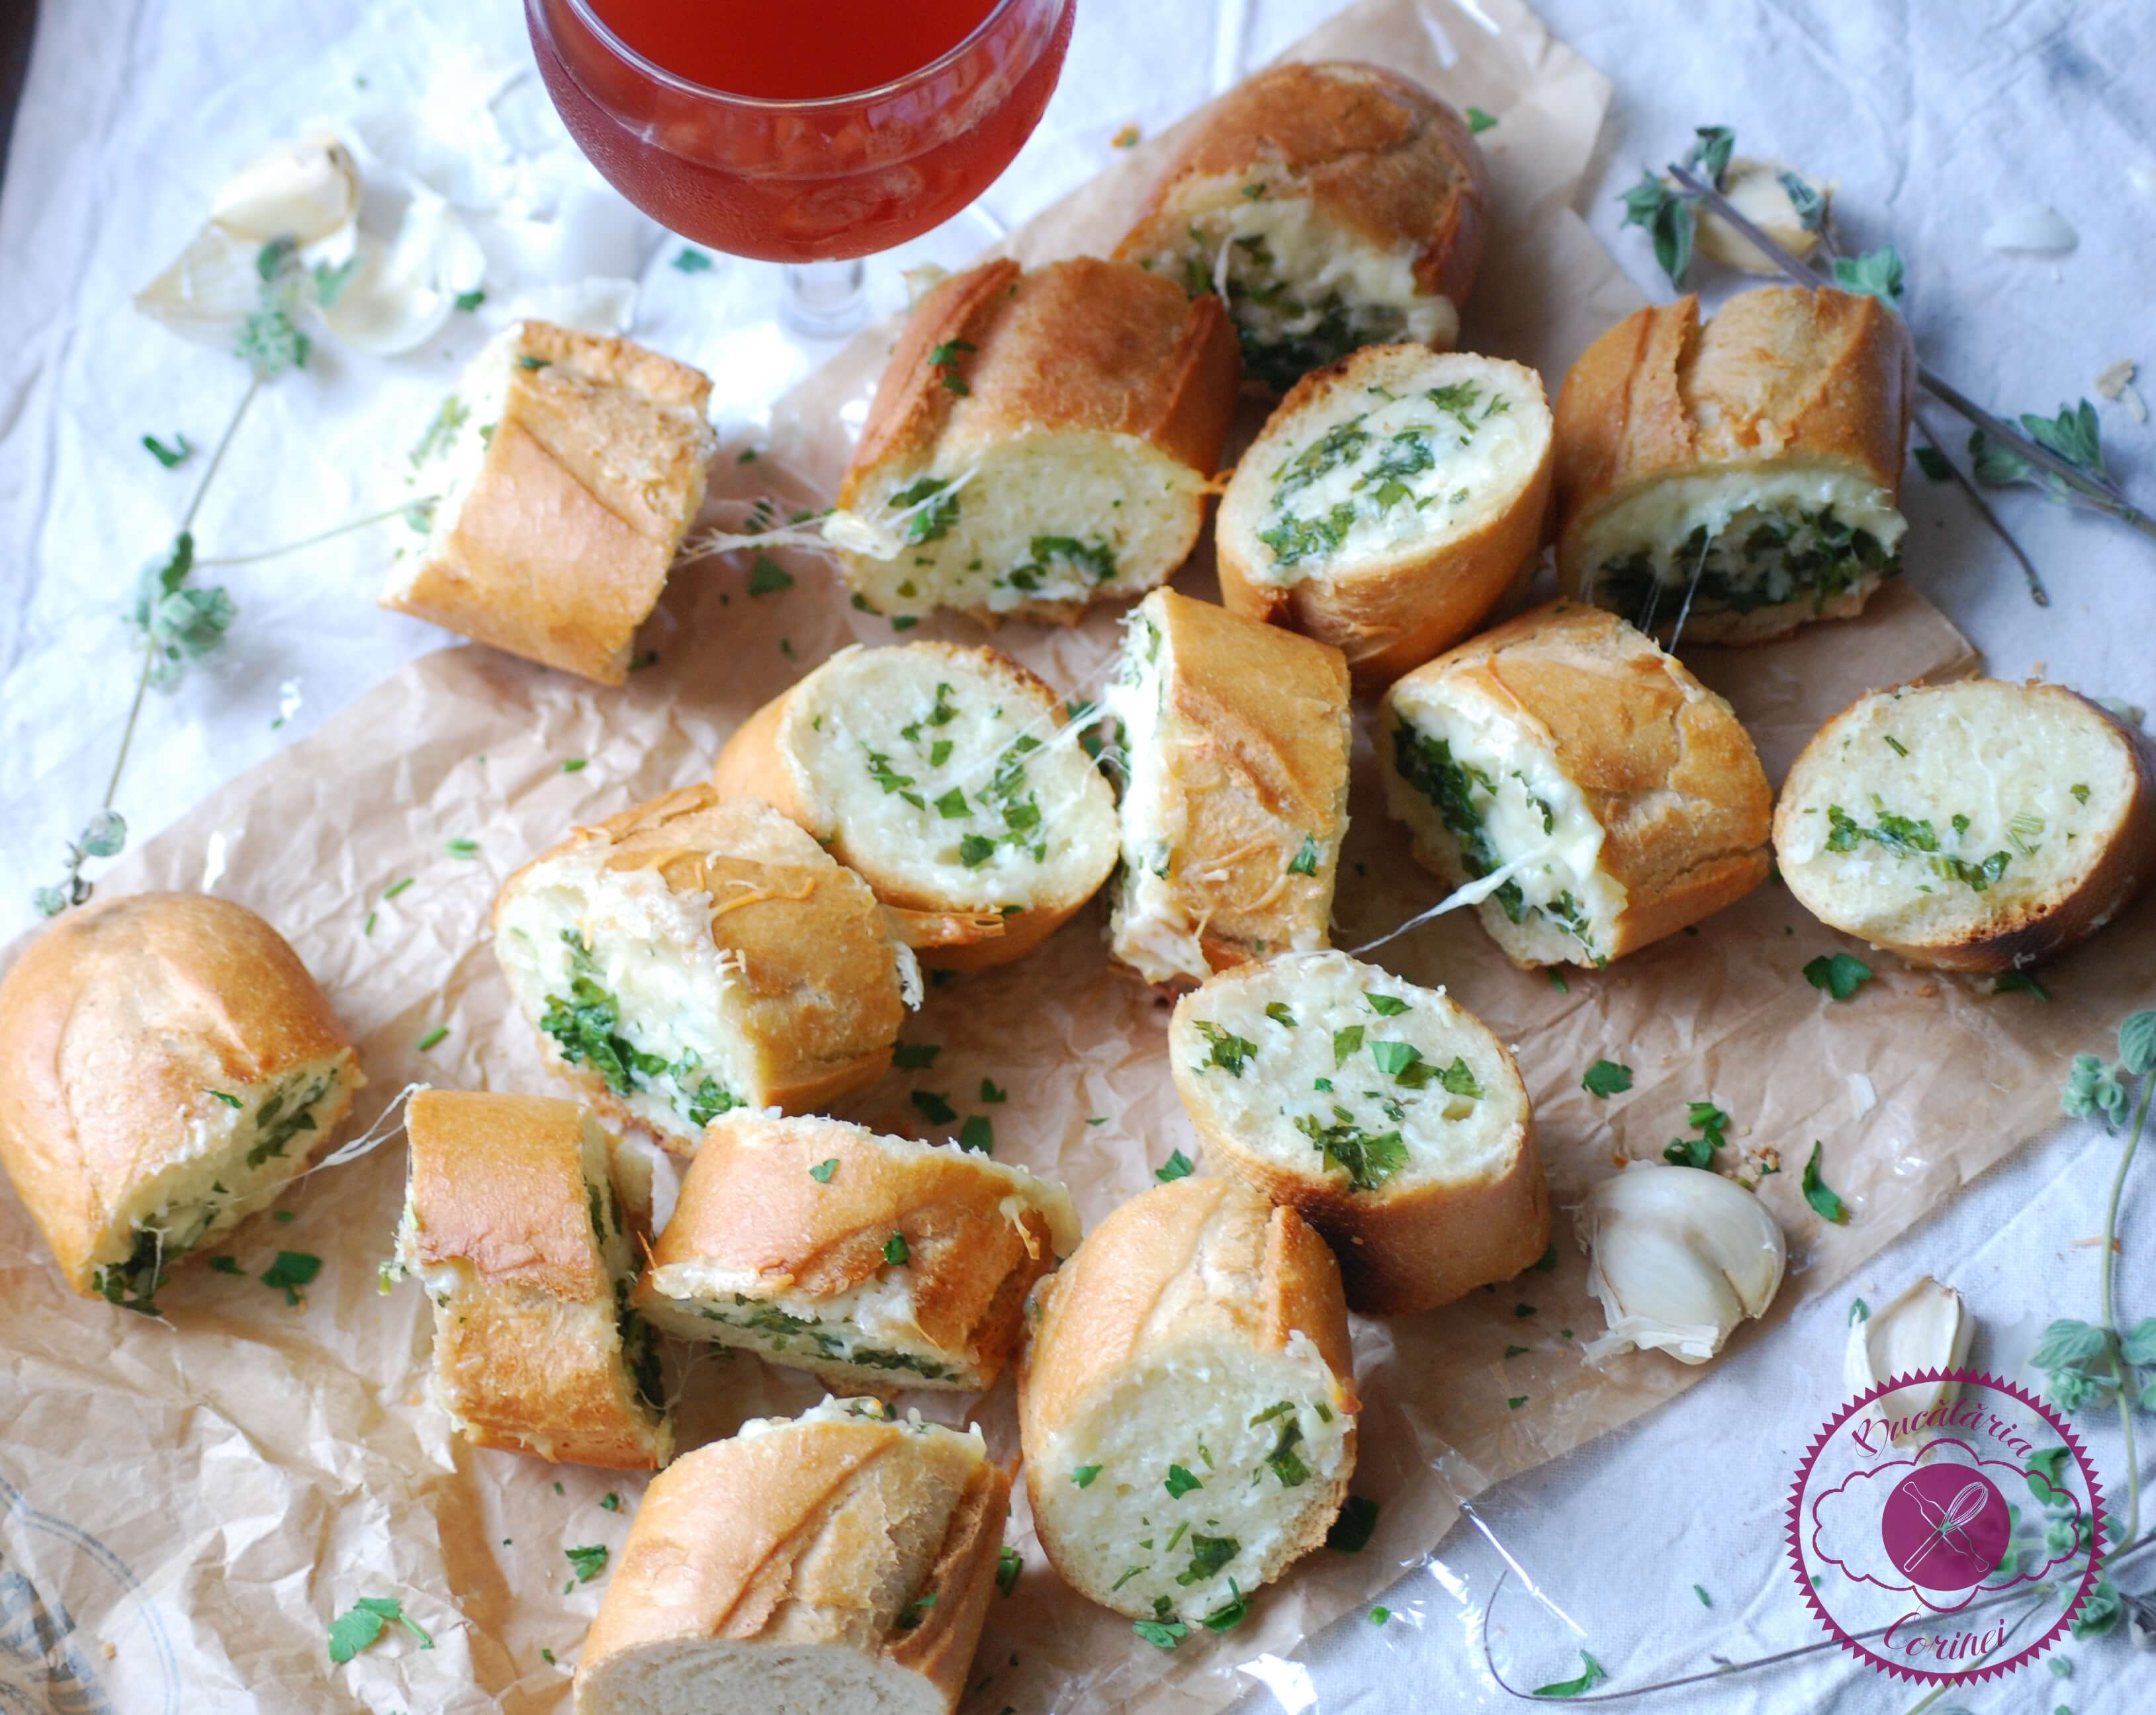 Paine cu usturoi (Garlic bread)